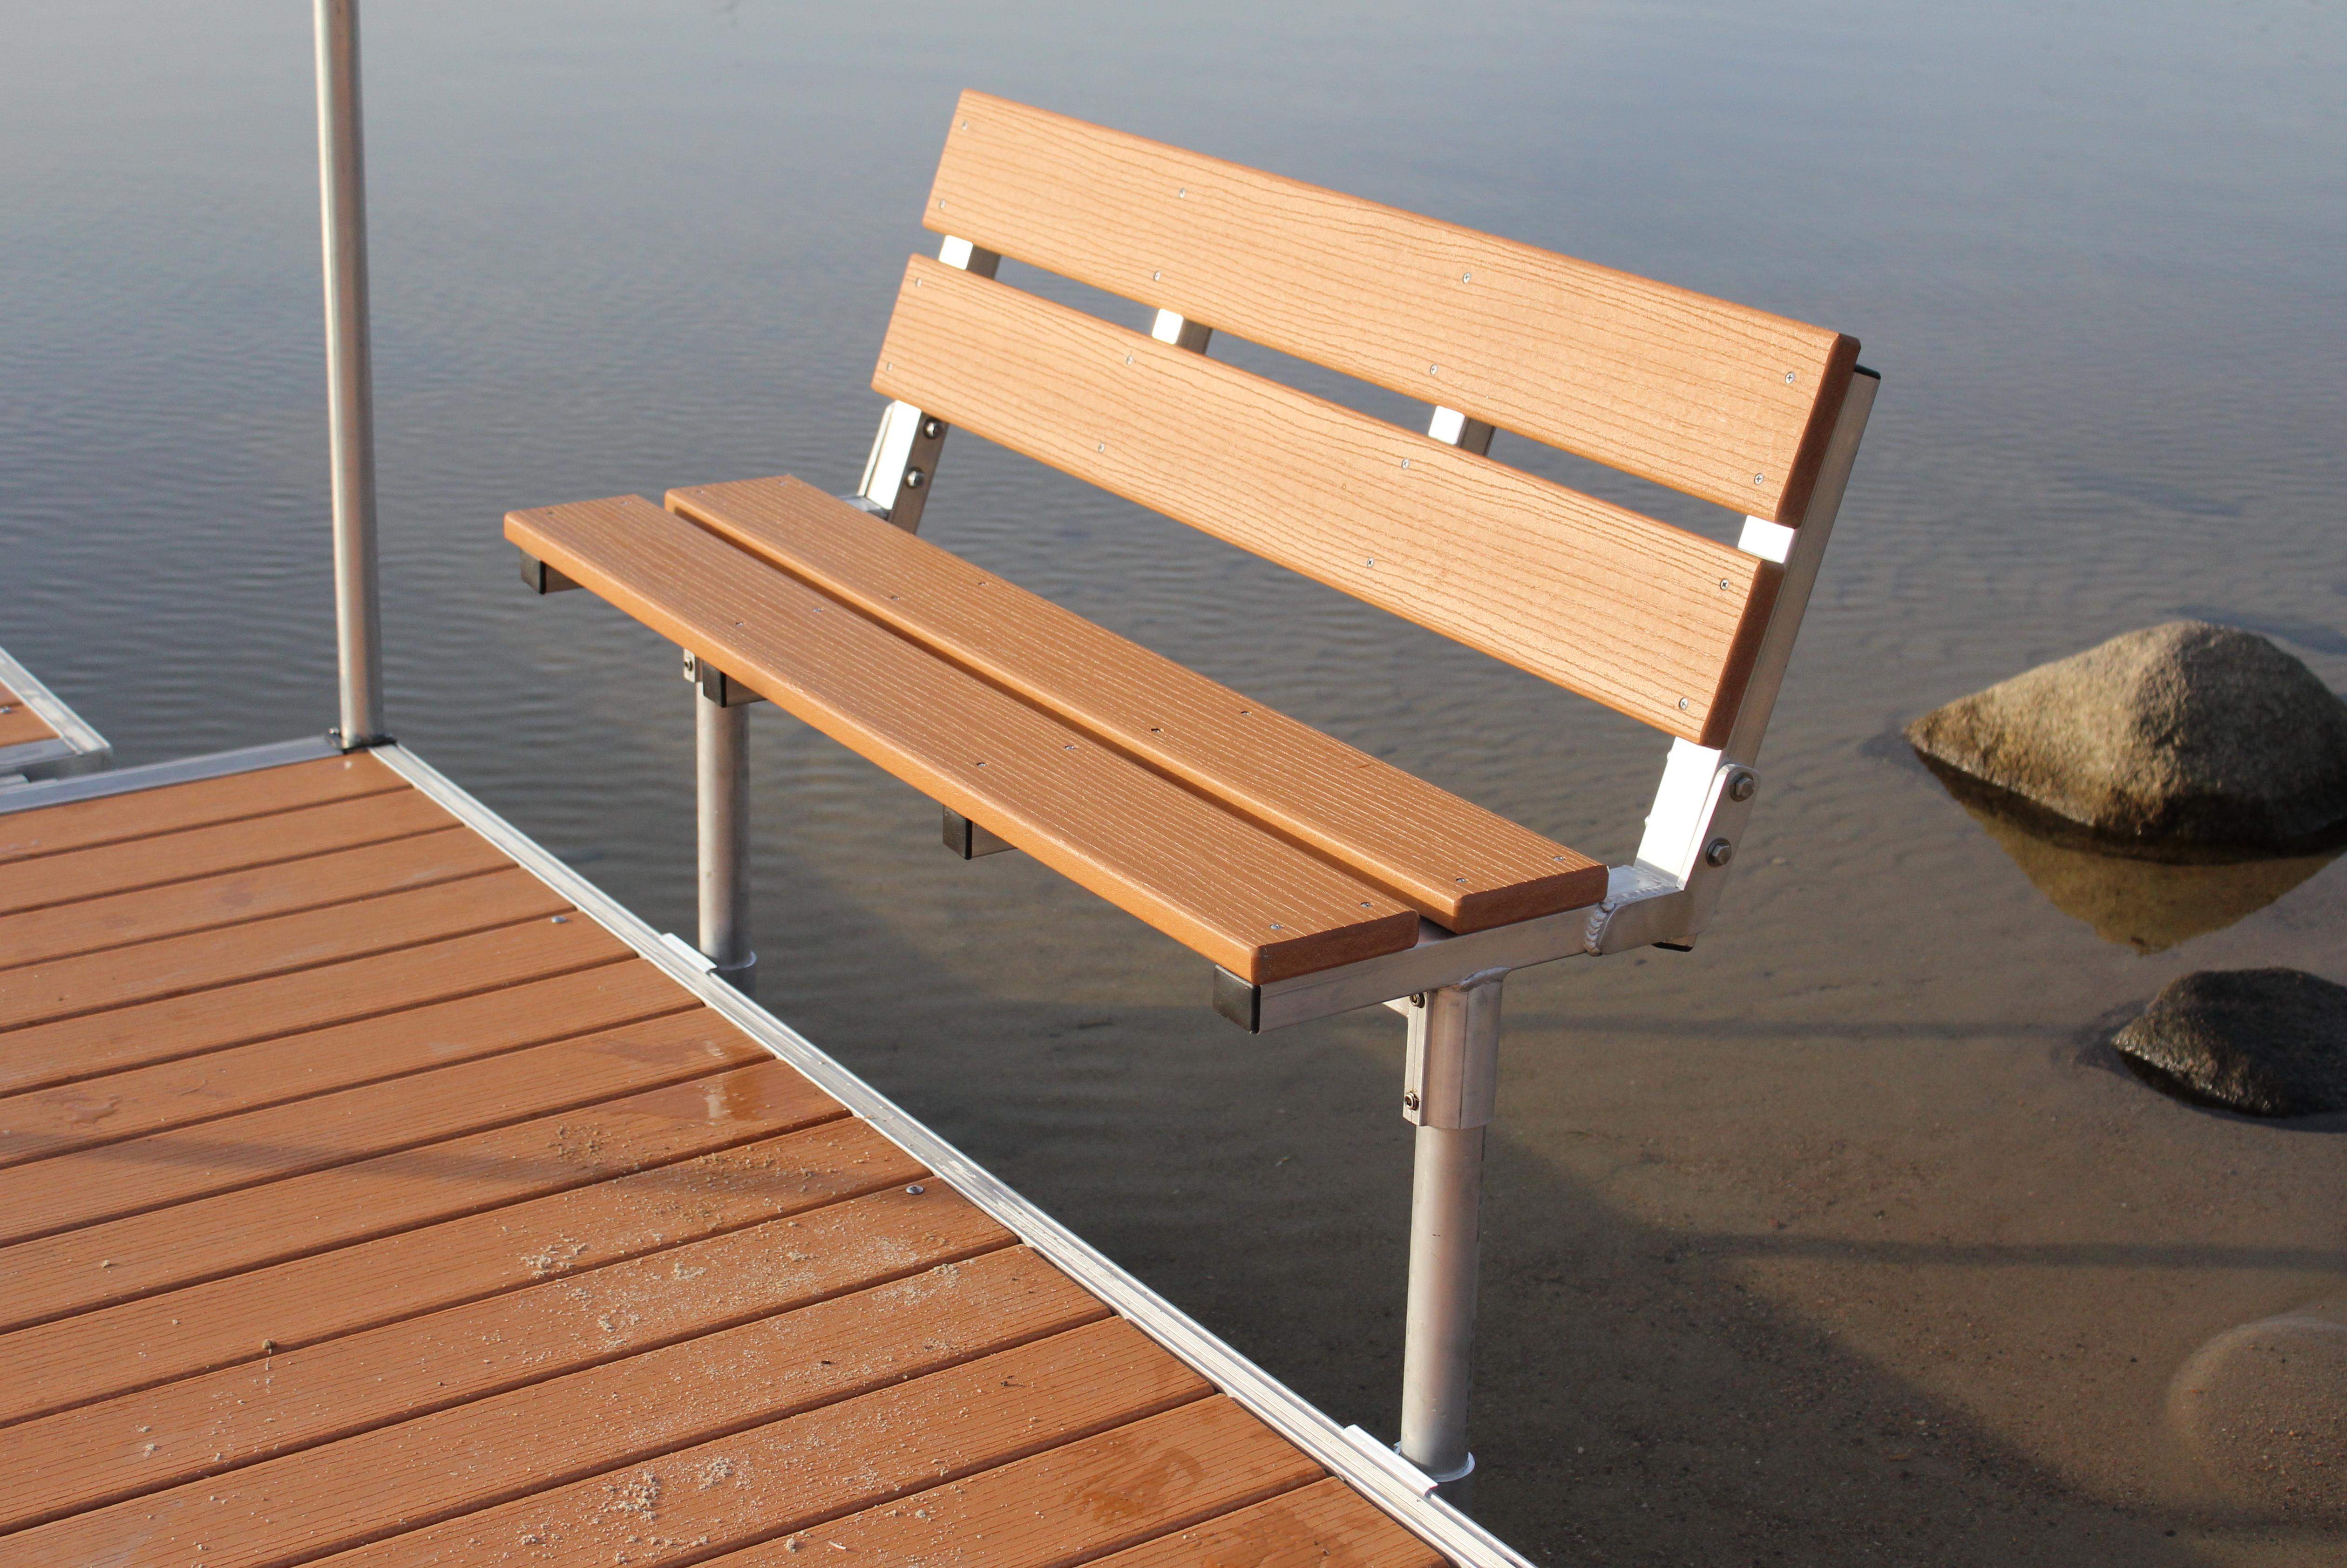 Bench Brackets For Deck Or Dock Home Design Ideas